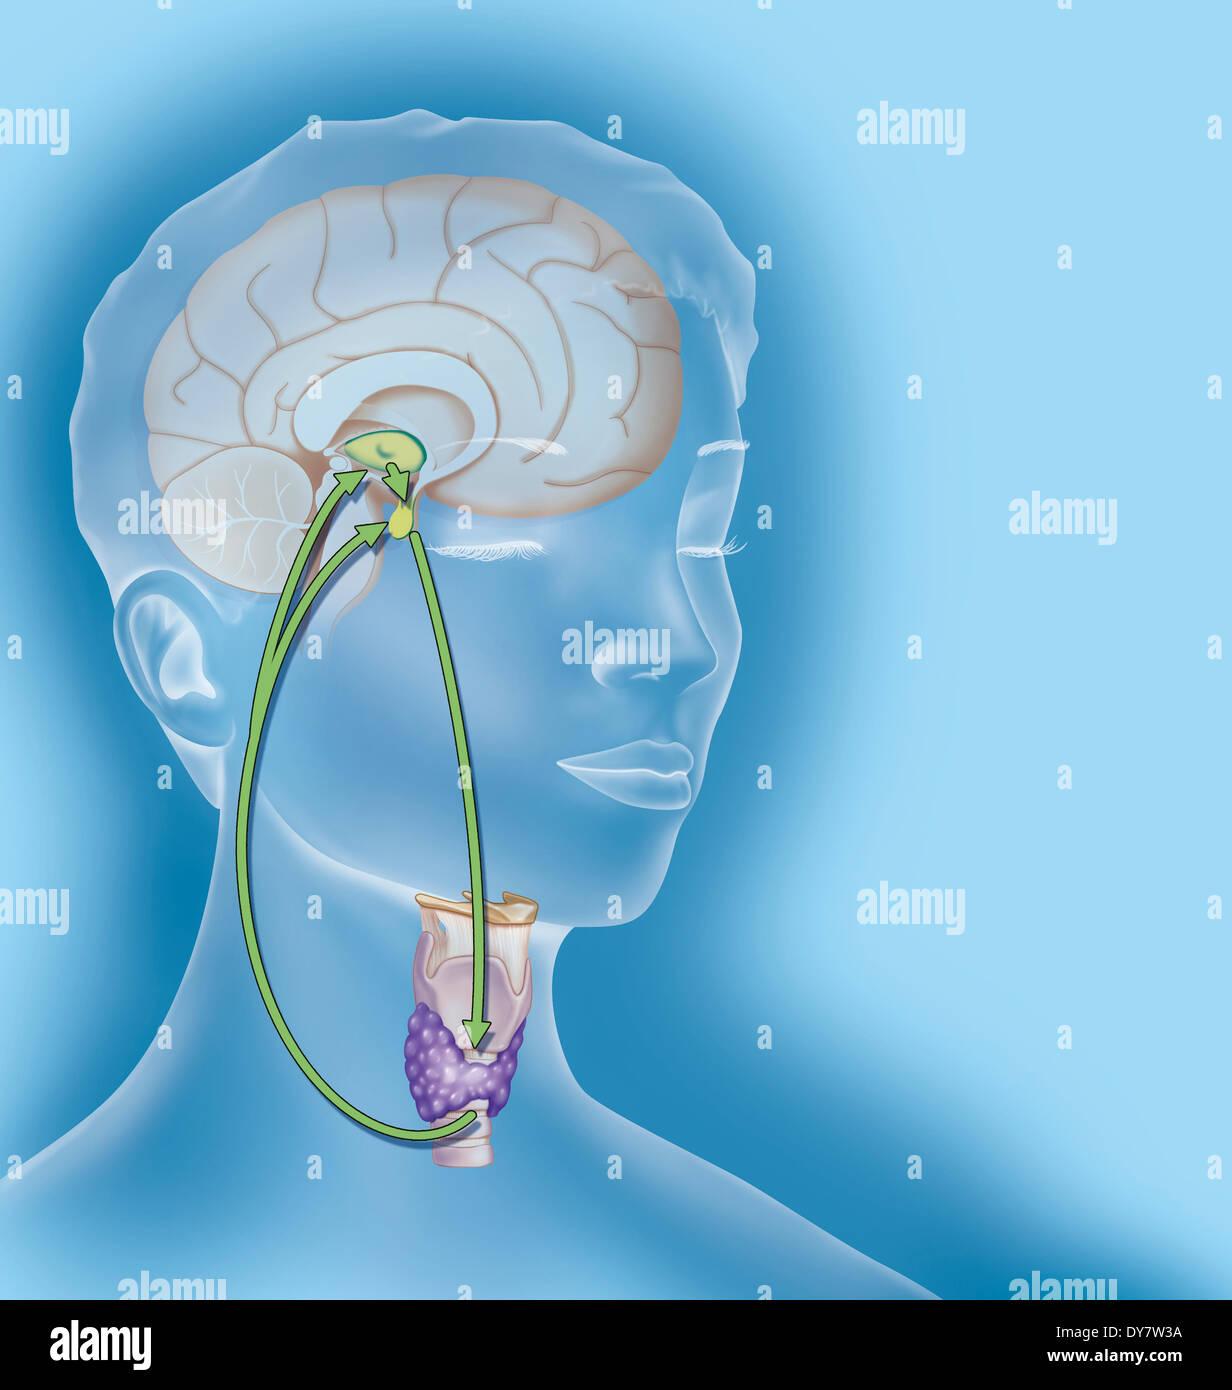 Thyroid regulation, illustration - Stock Image